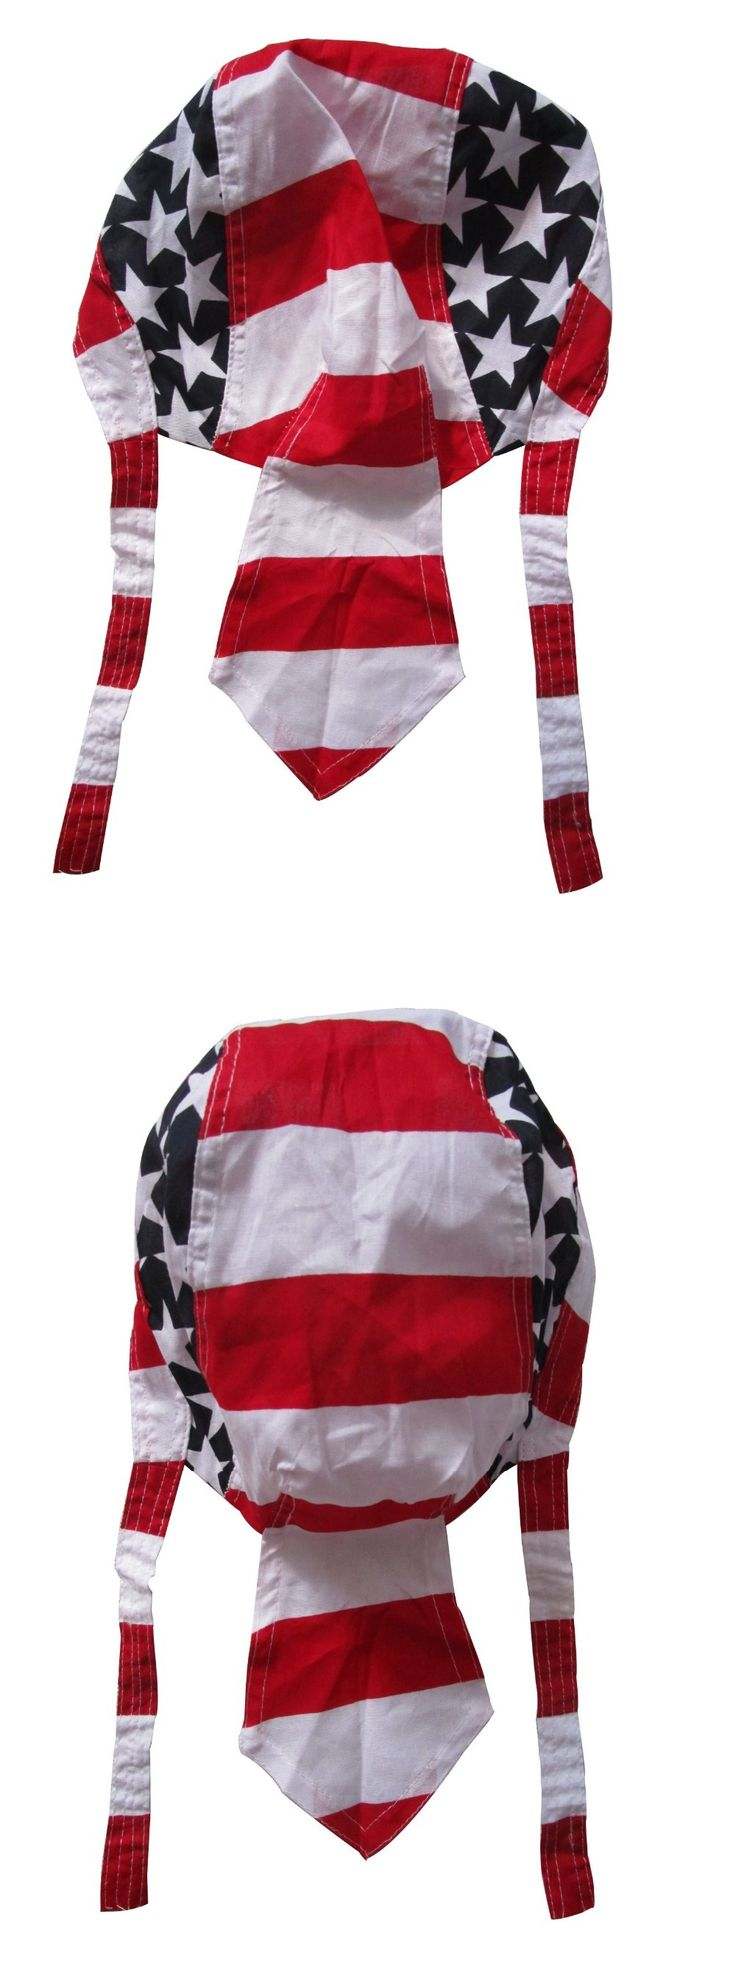 Free Shipping 2017 New Mountain Biking Outdoor Cotton Red White Star American Flag Bandanas Head Wraps Durag Caps For Mens Male